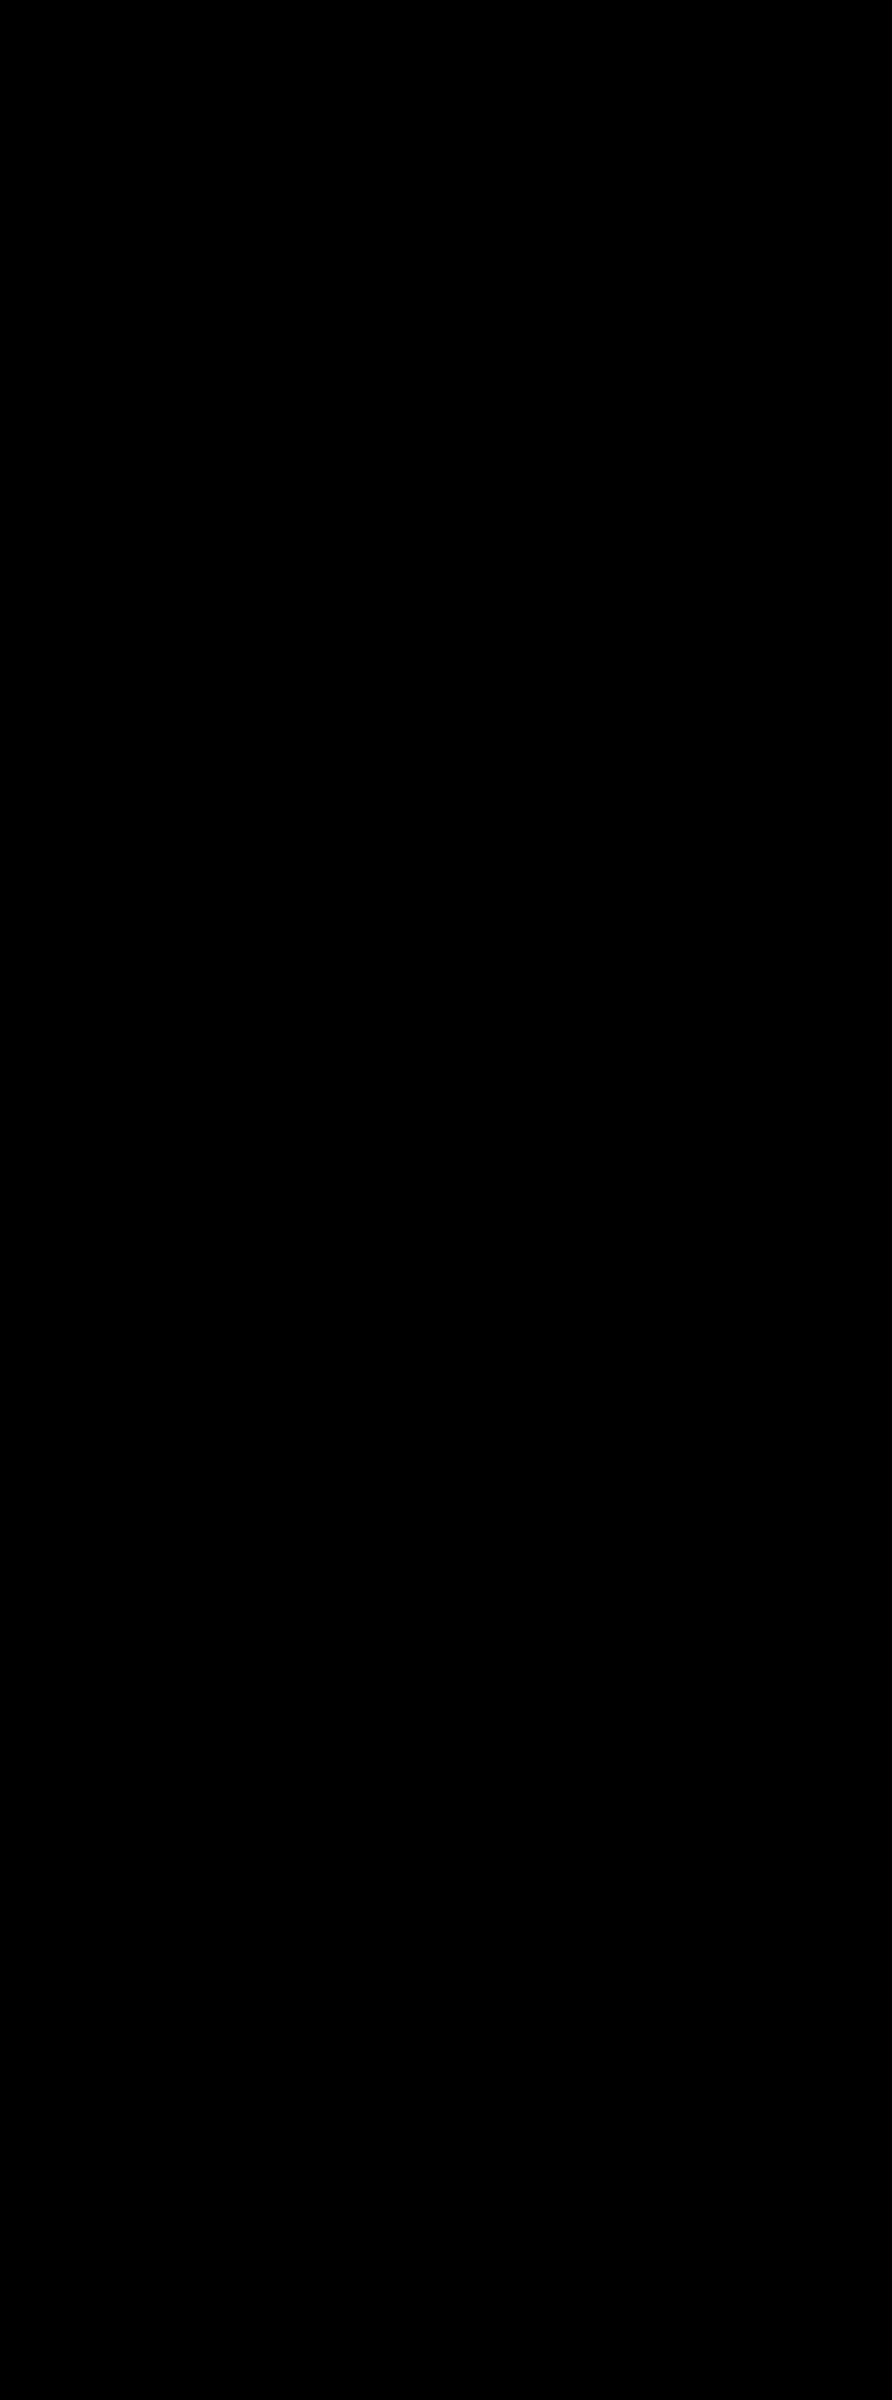 Clipart - Pen Icon